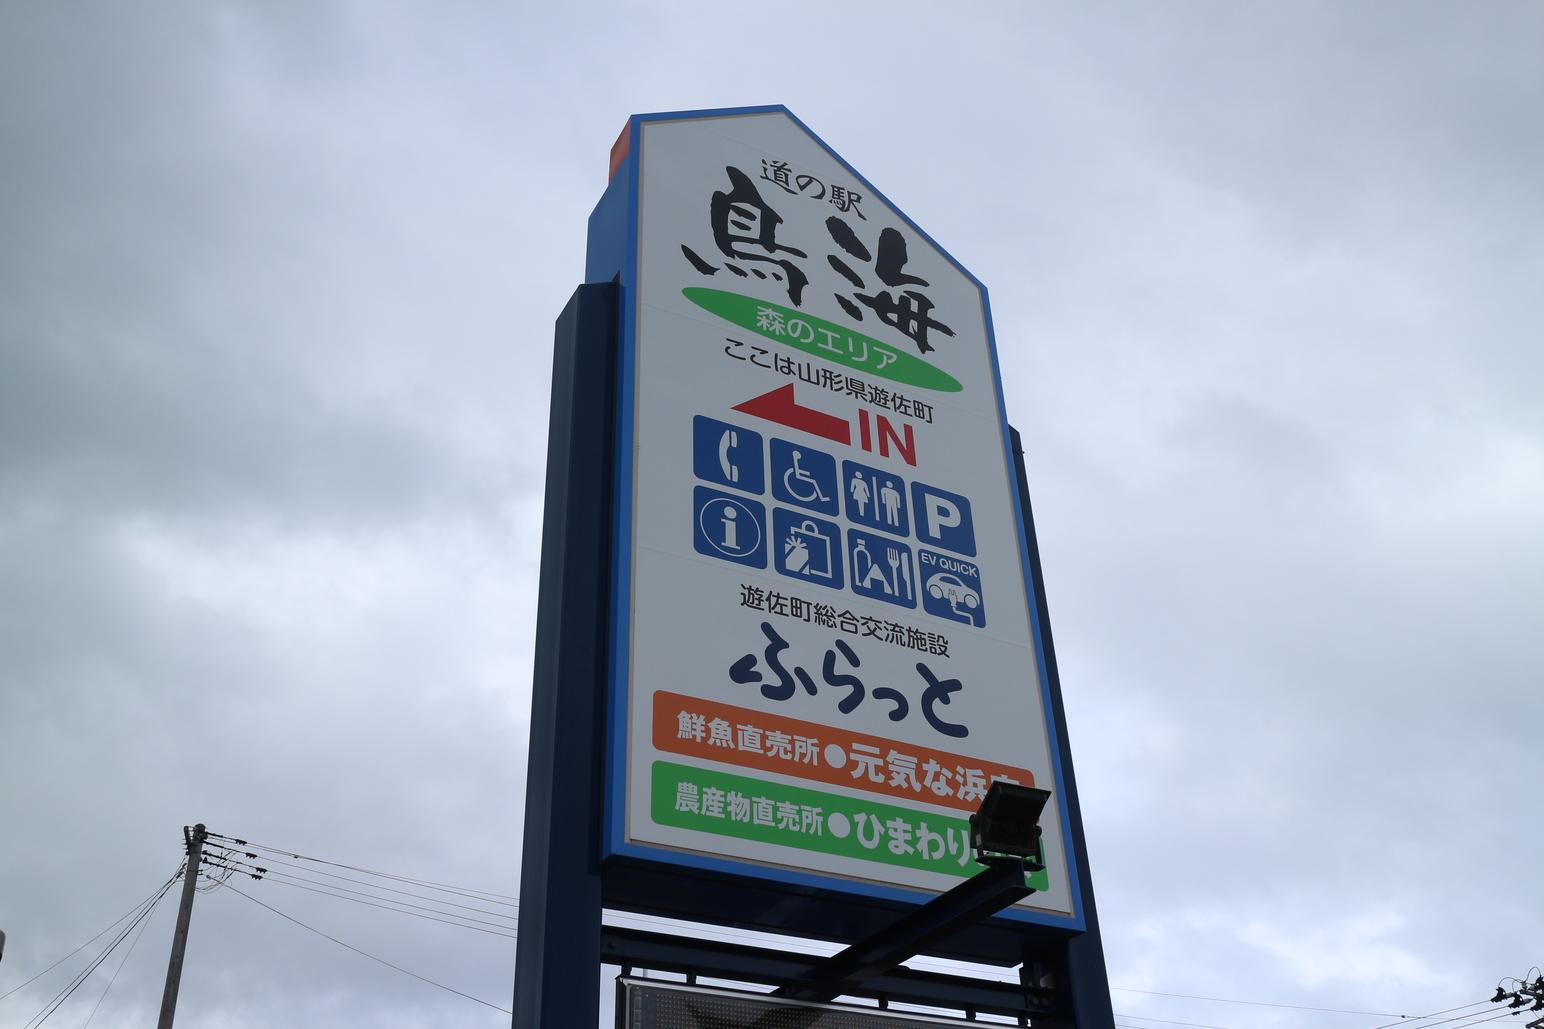 鮮魚直売所 元気な浜店